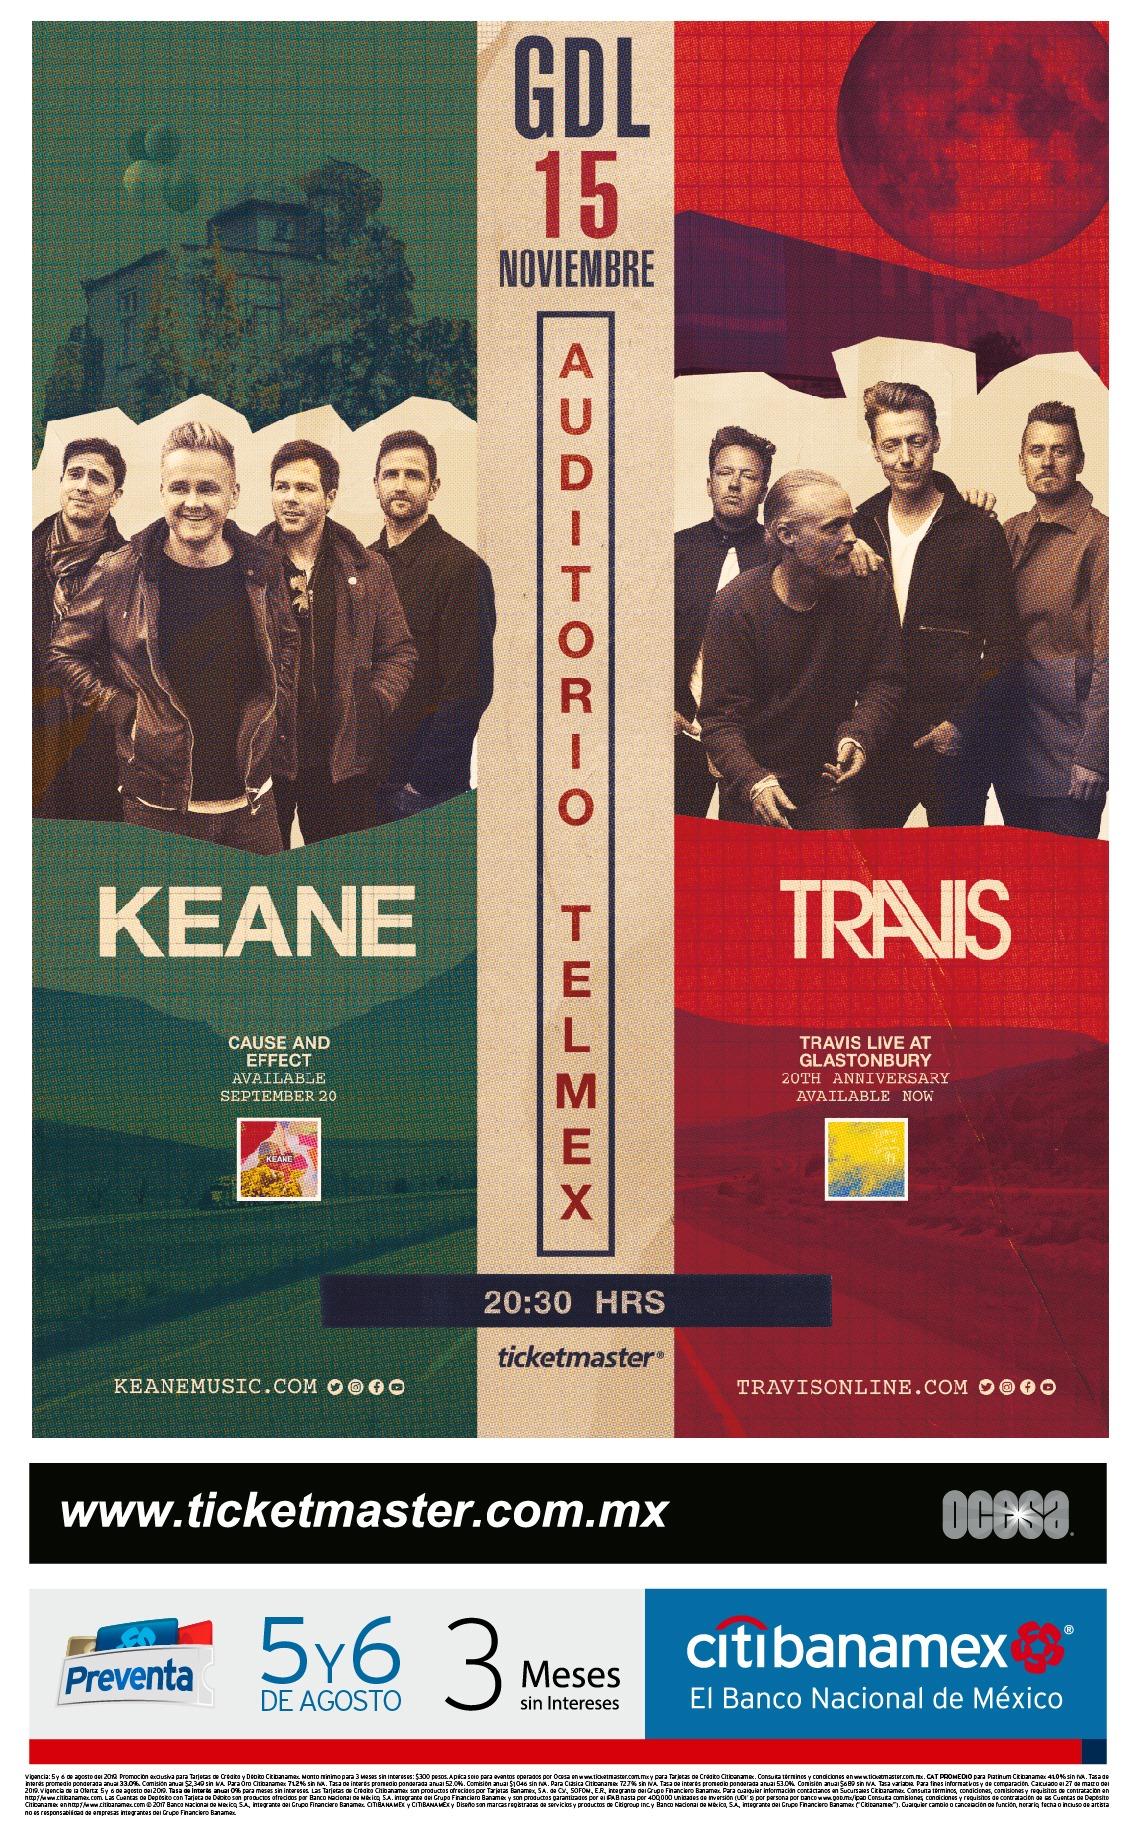 Keane & Travis, 15 Noviembre en Auditorio Telmex